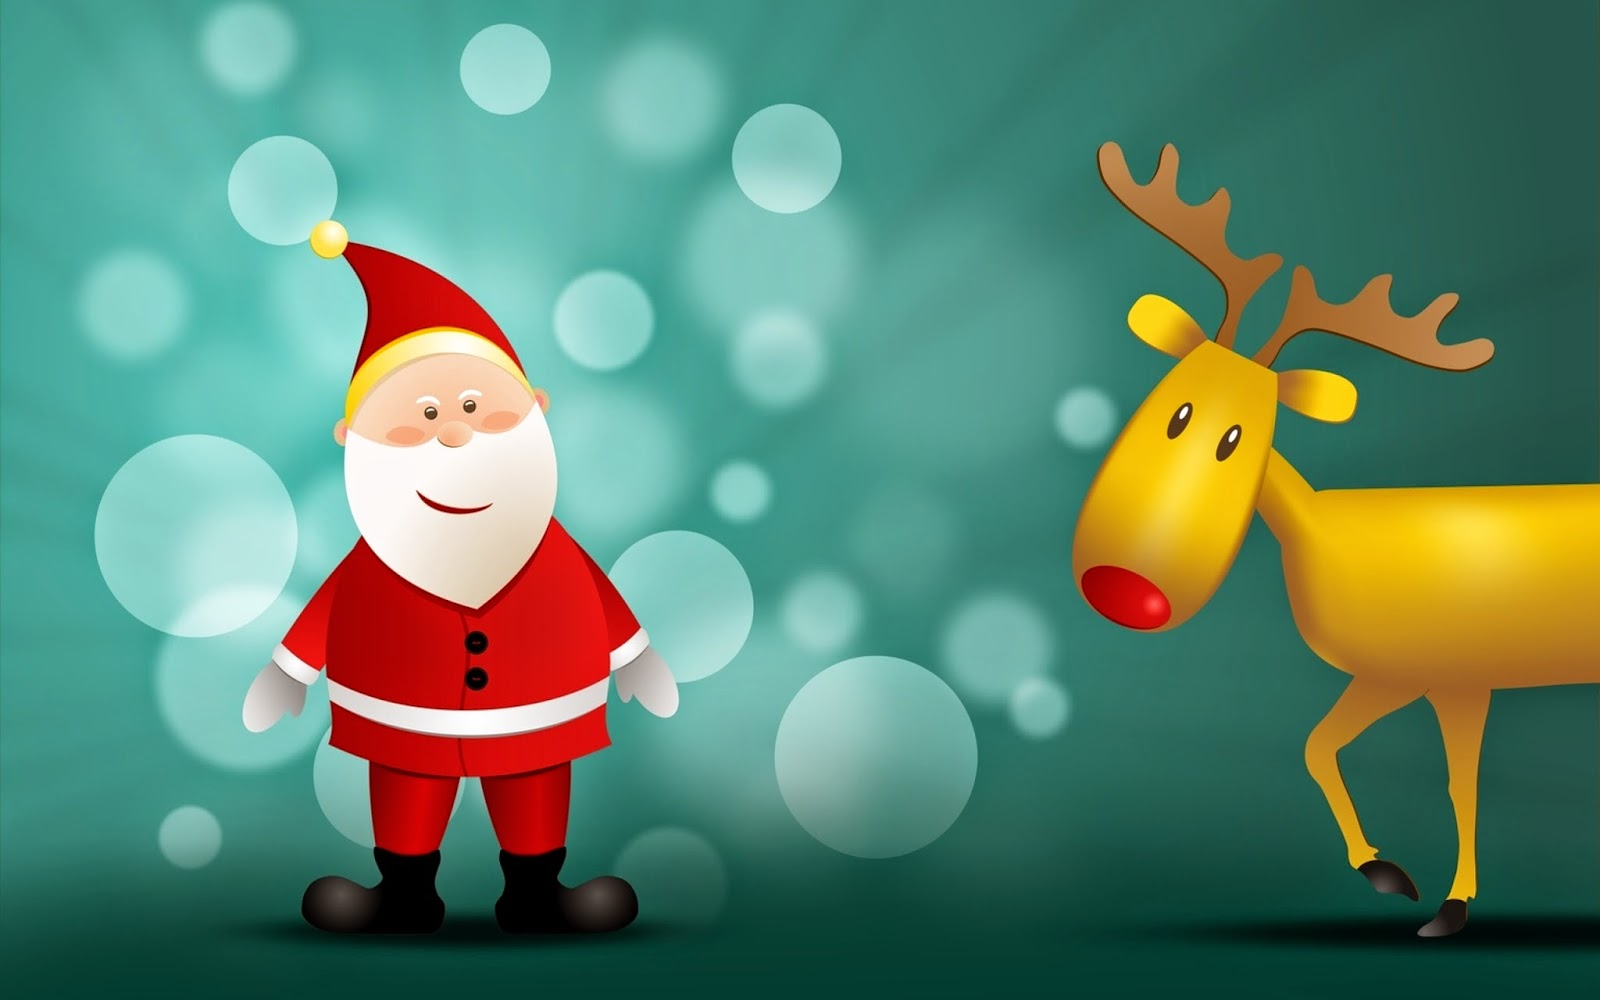 Santa-Claus-with-reindeer-cartoon-HD-photo-image-free-download.jpg